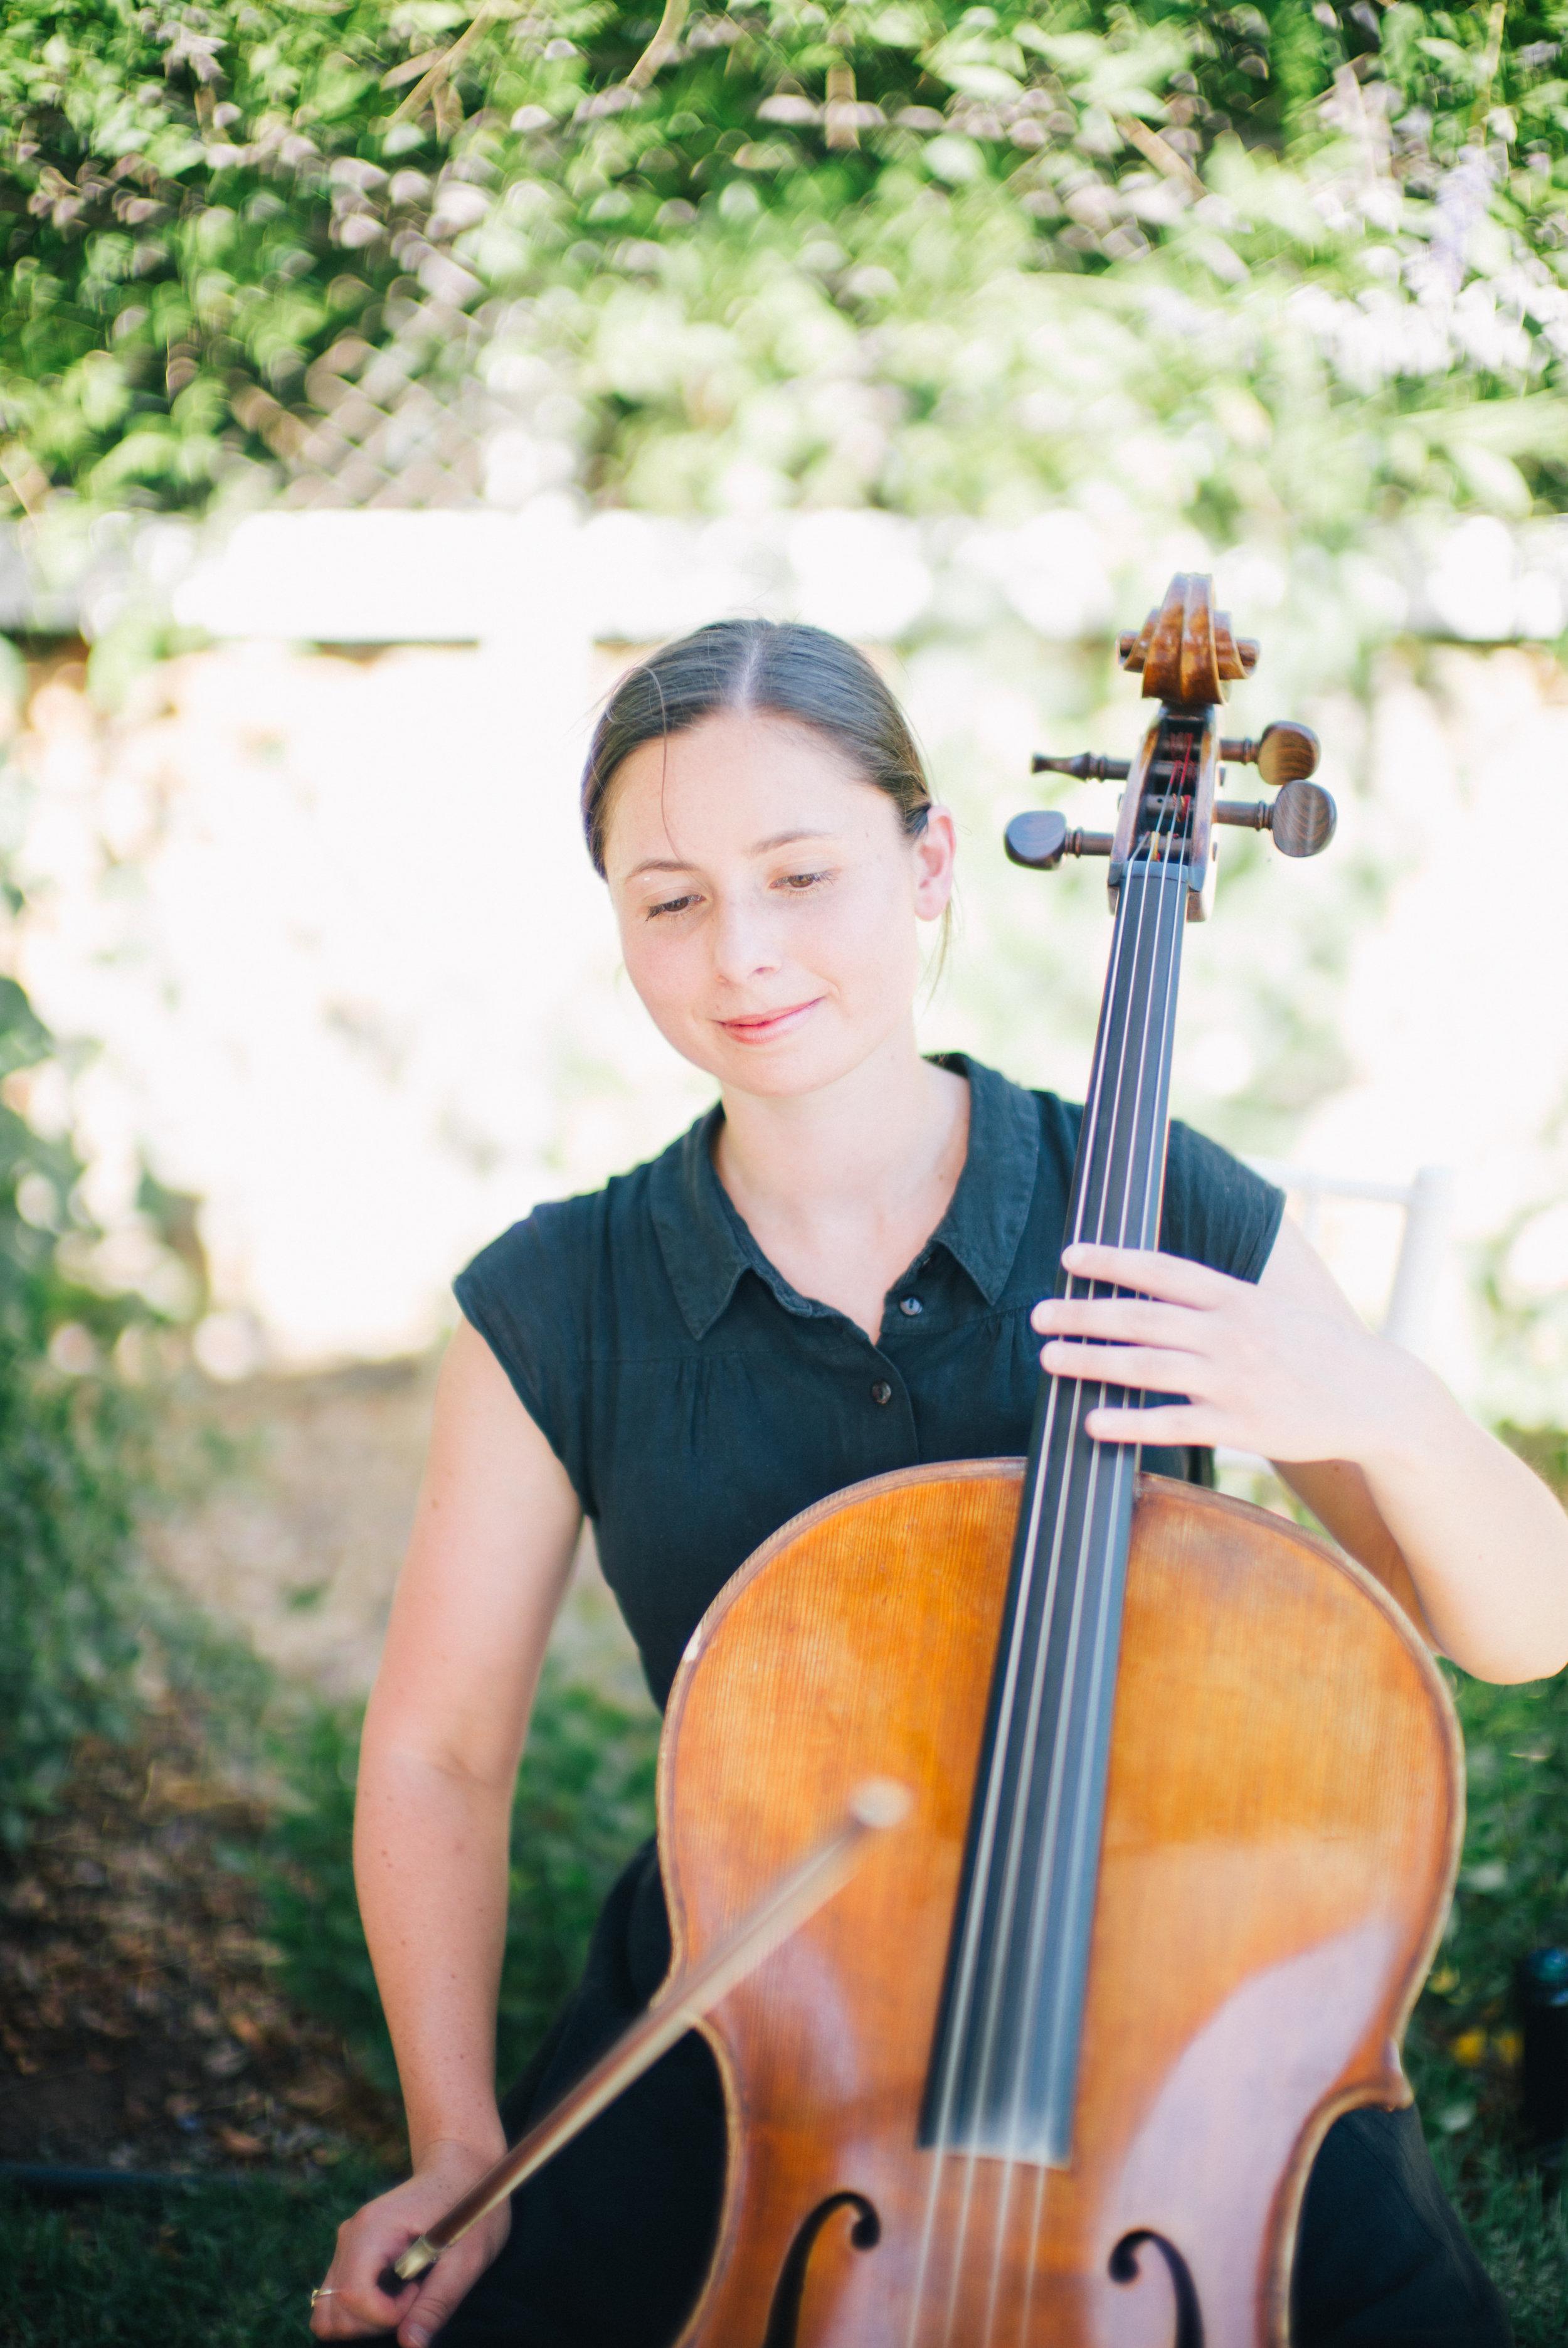 perth-function-string-music-hire-wedding-riverside-musiciansperth-function-string-music-hire-wedding-riverside-musicians-classical-contemporary-cello-cellist-solo